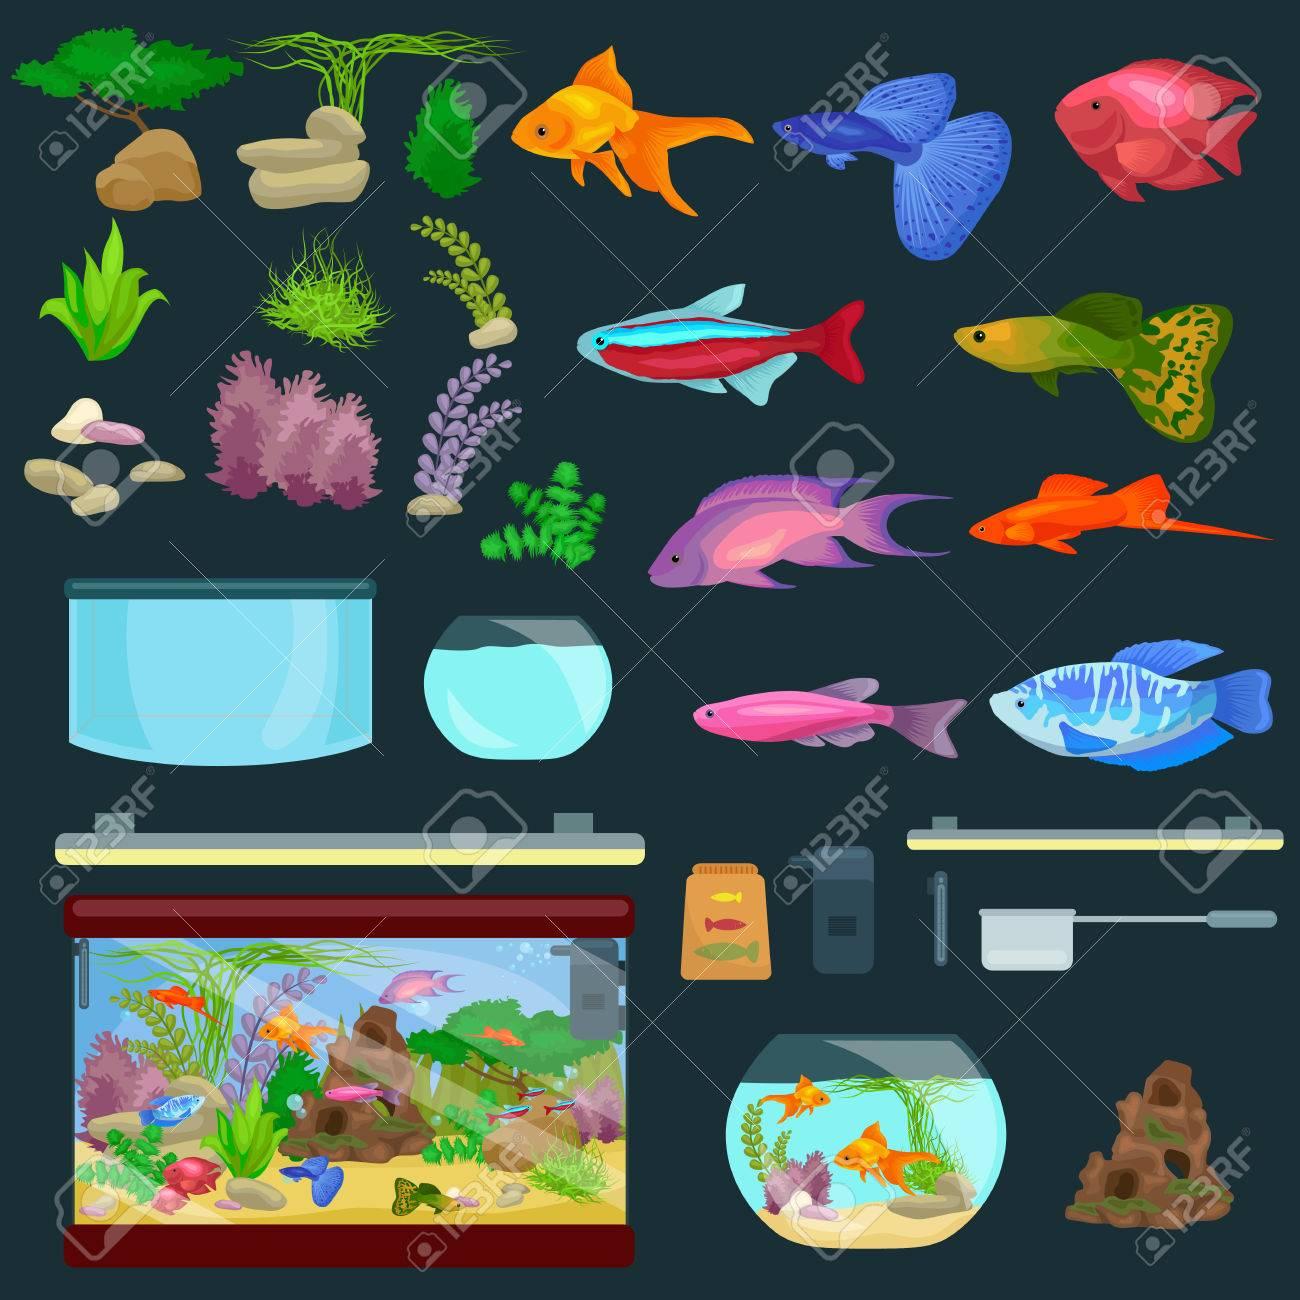 Aquarium fish, seaweed underwater, banner template layout with marine animal vector illustration - 57030662